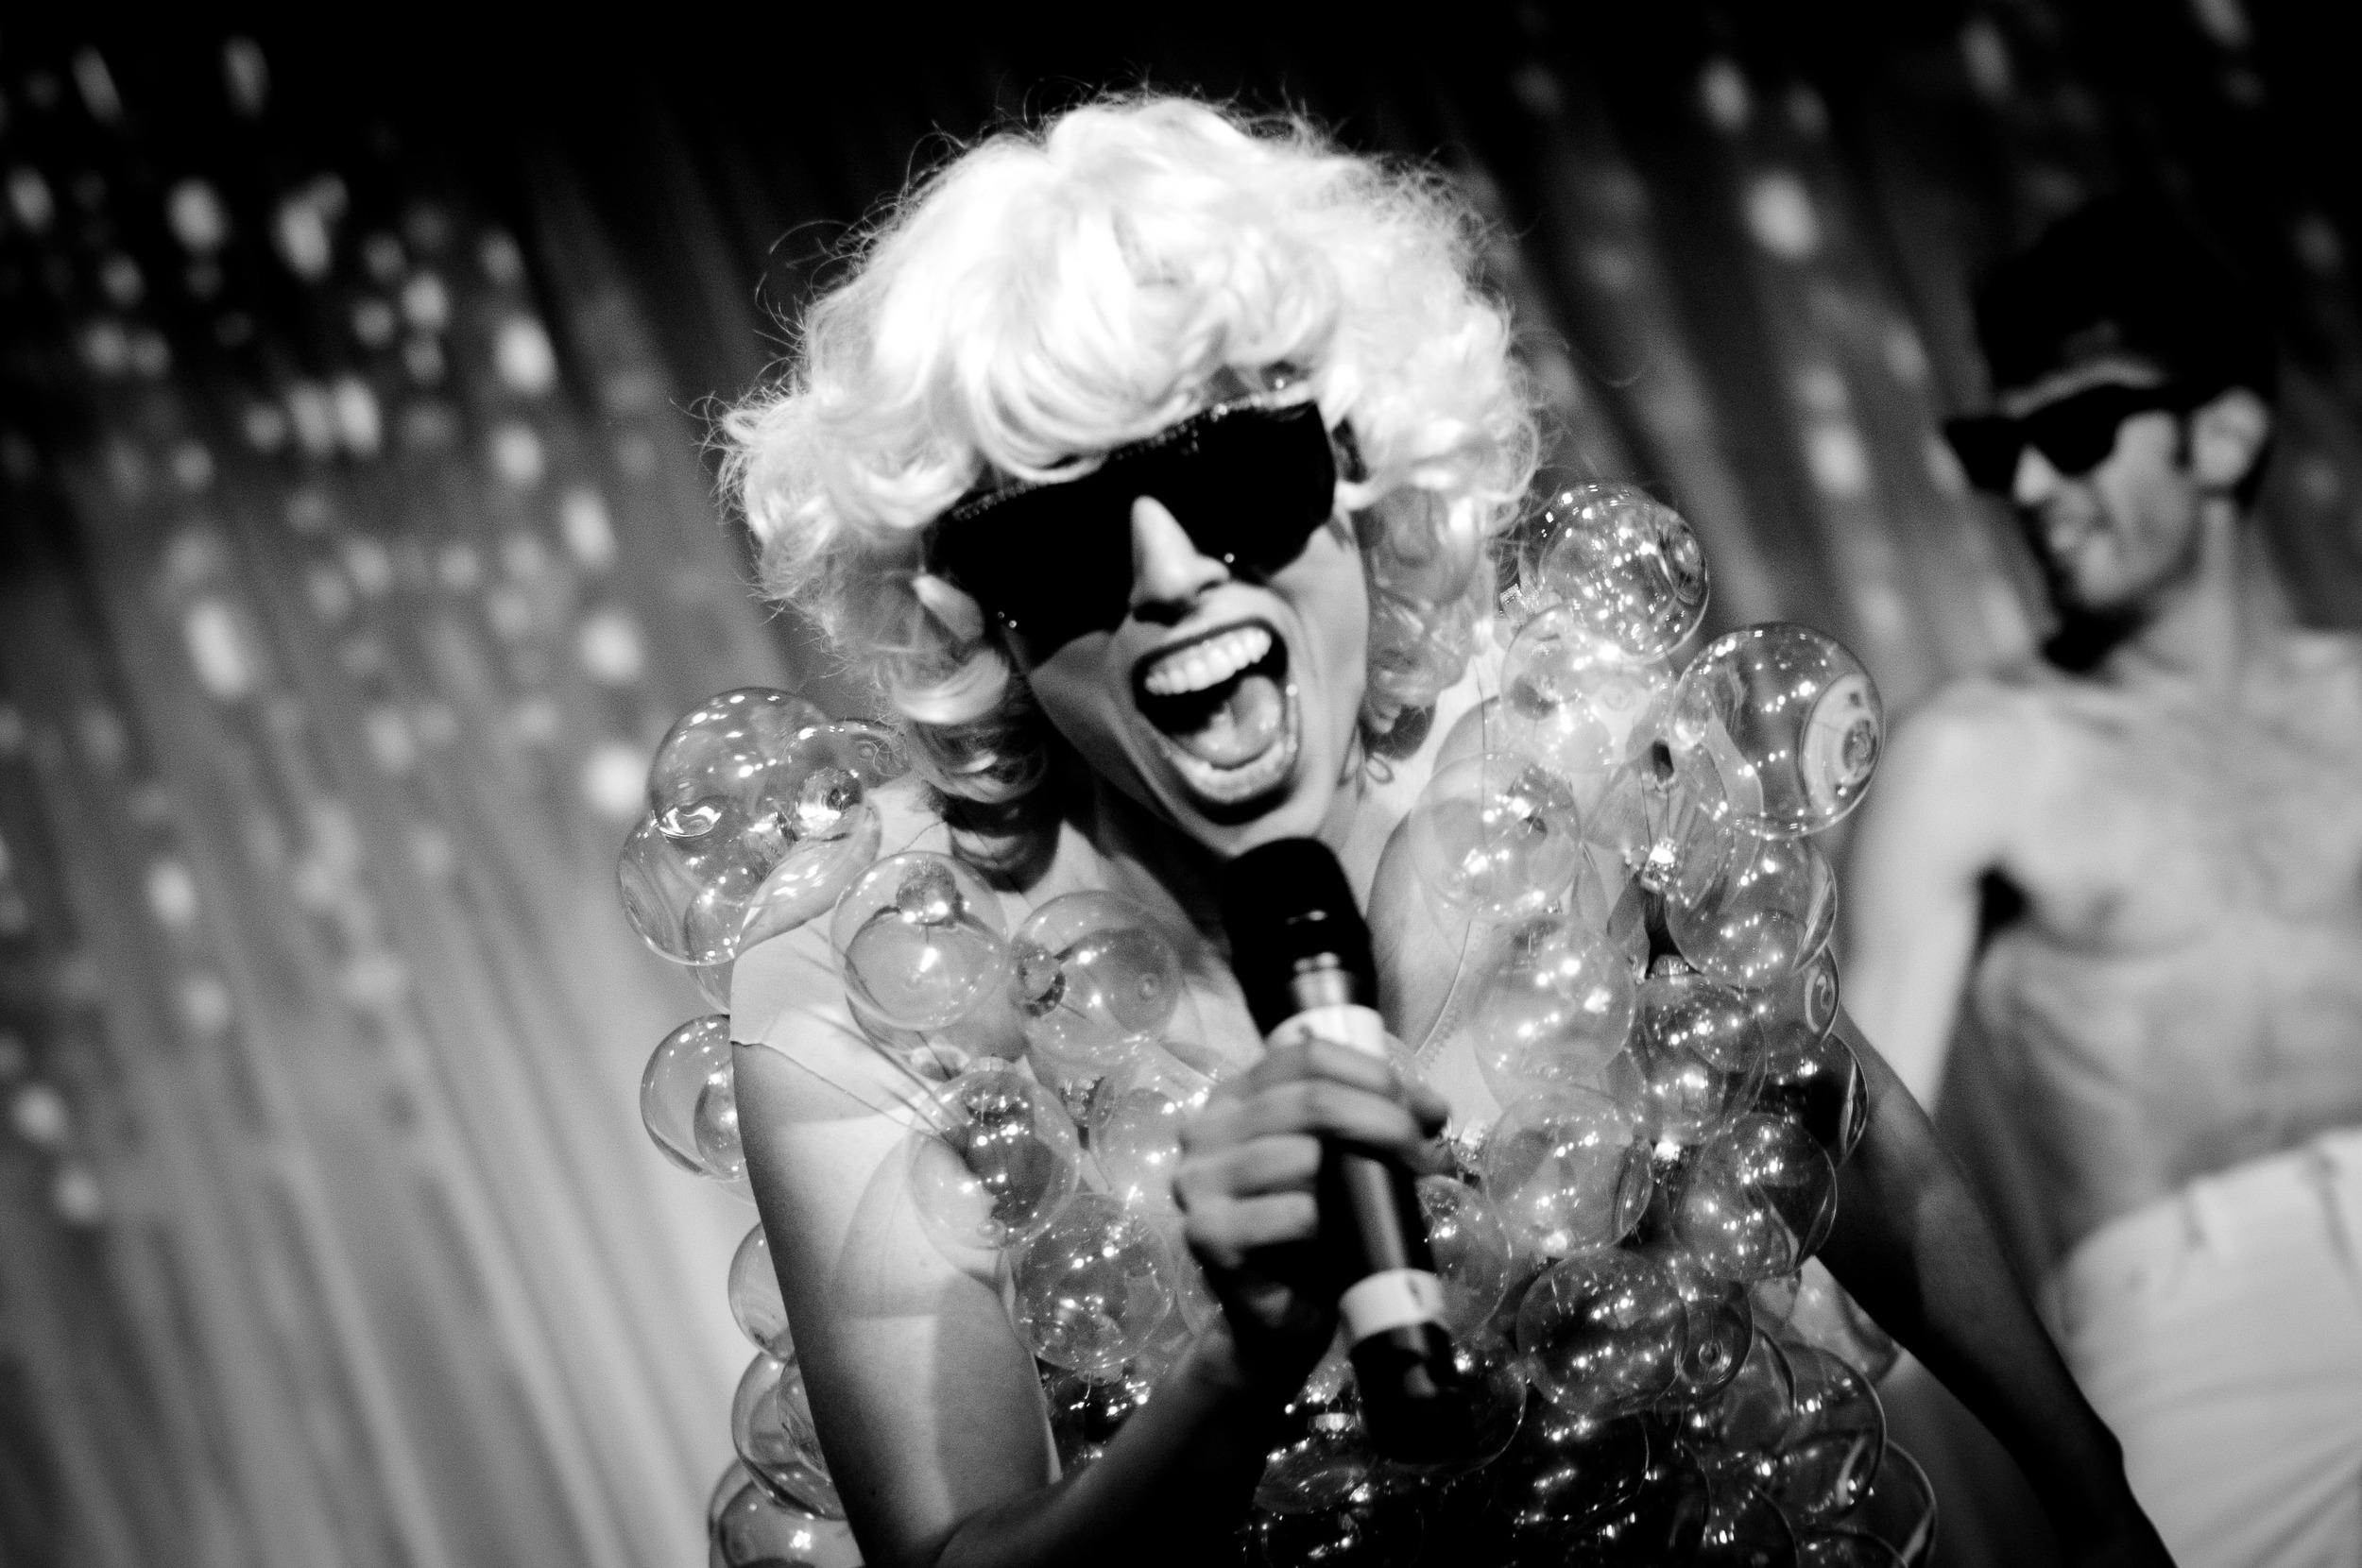 Performing live as Lady Gaga